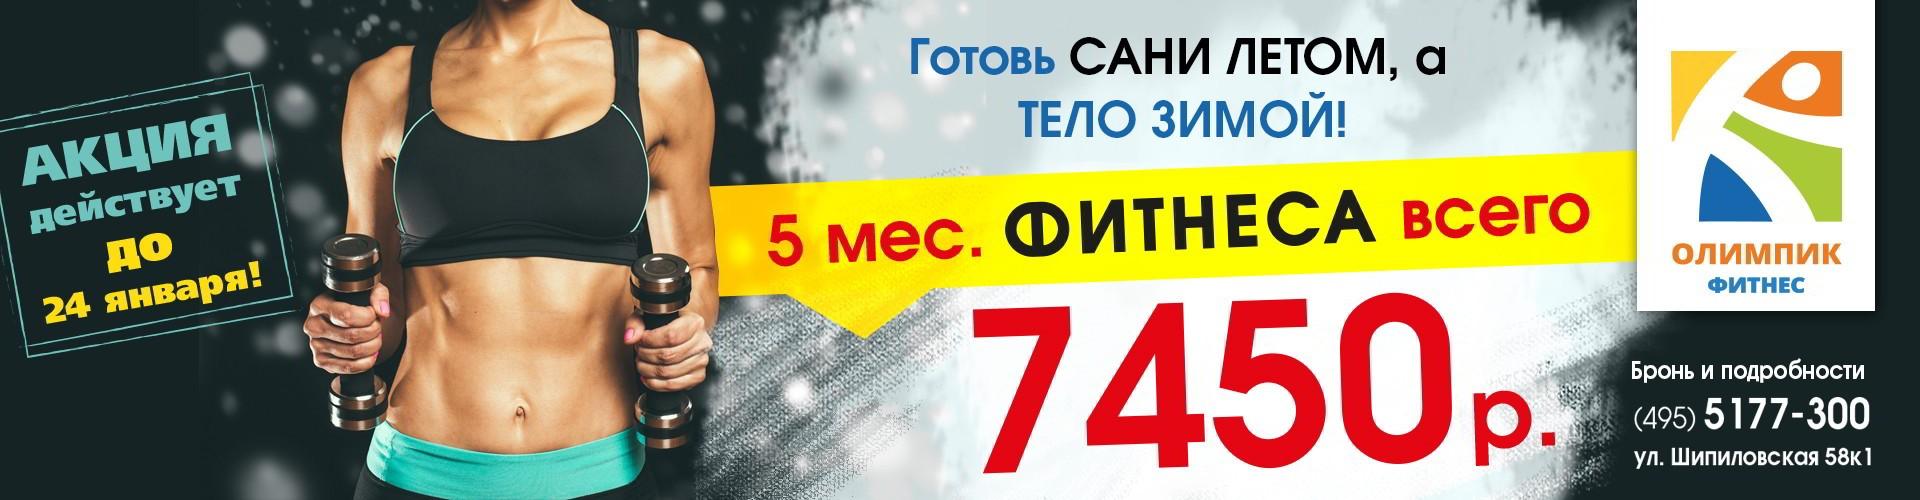 img_4664-17-01-20-04-59